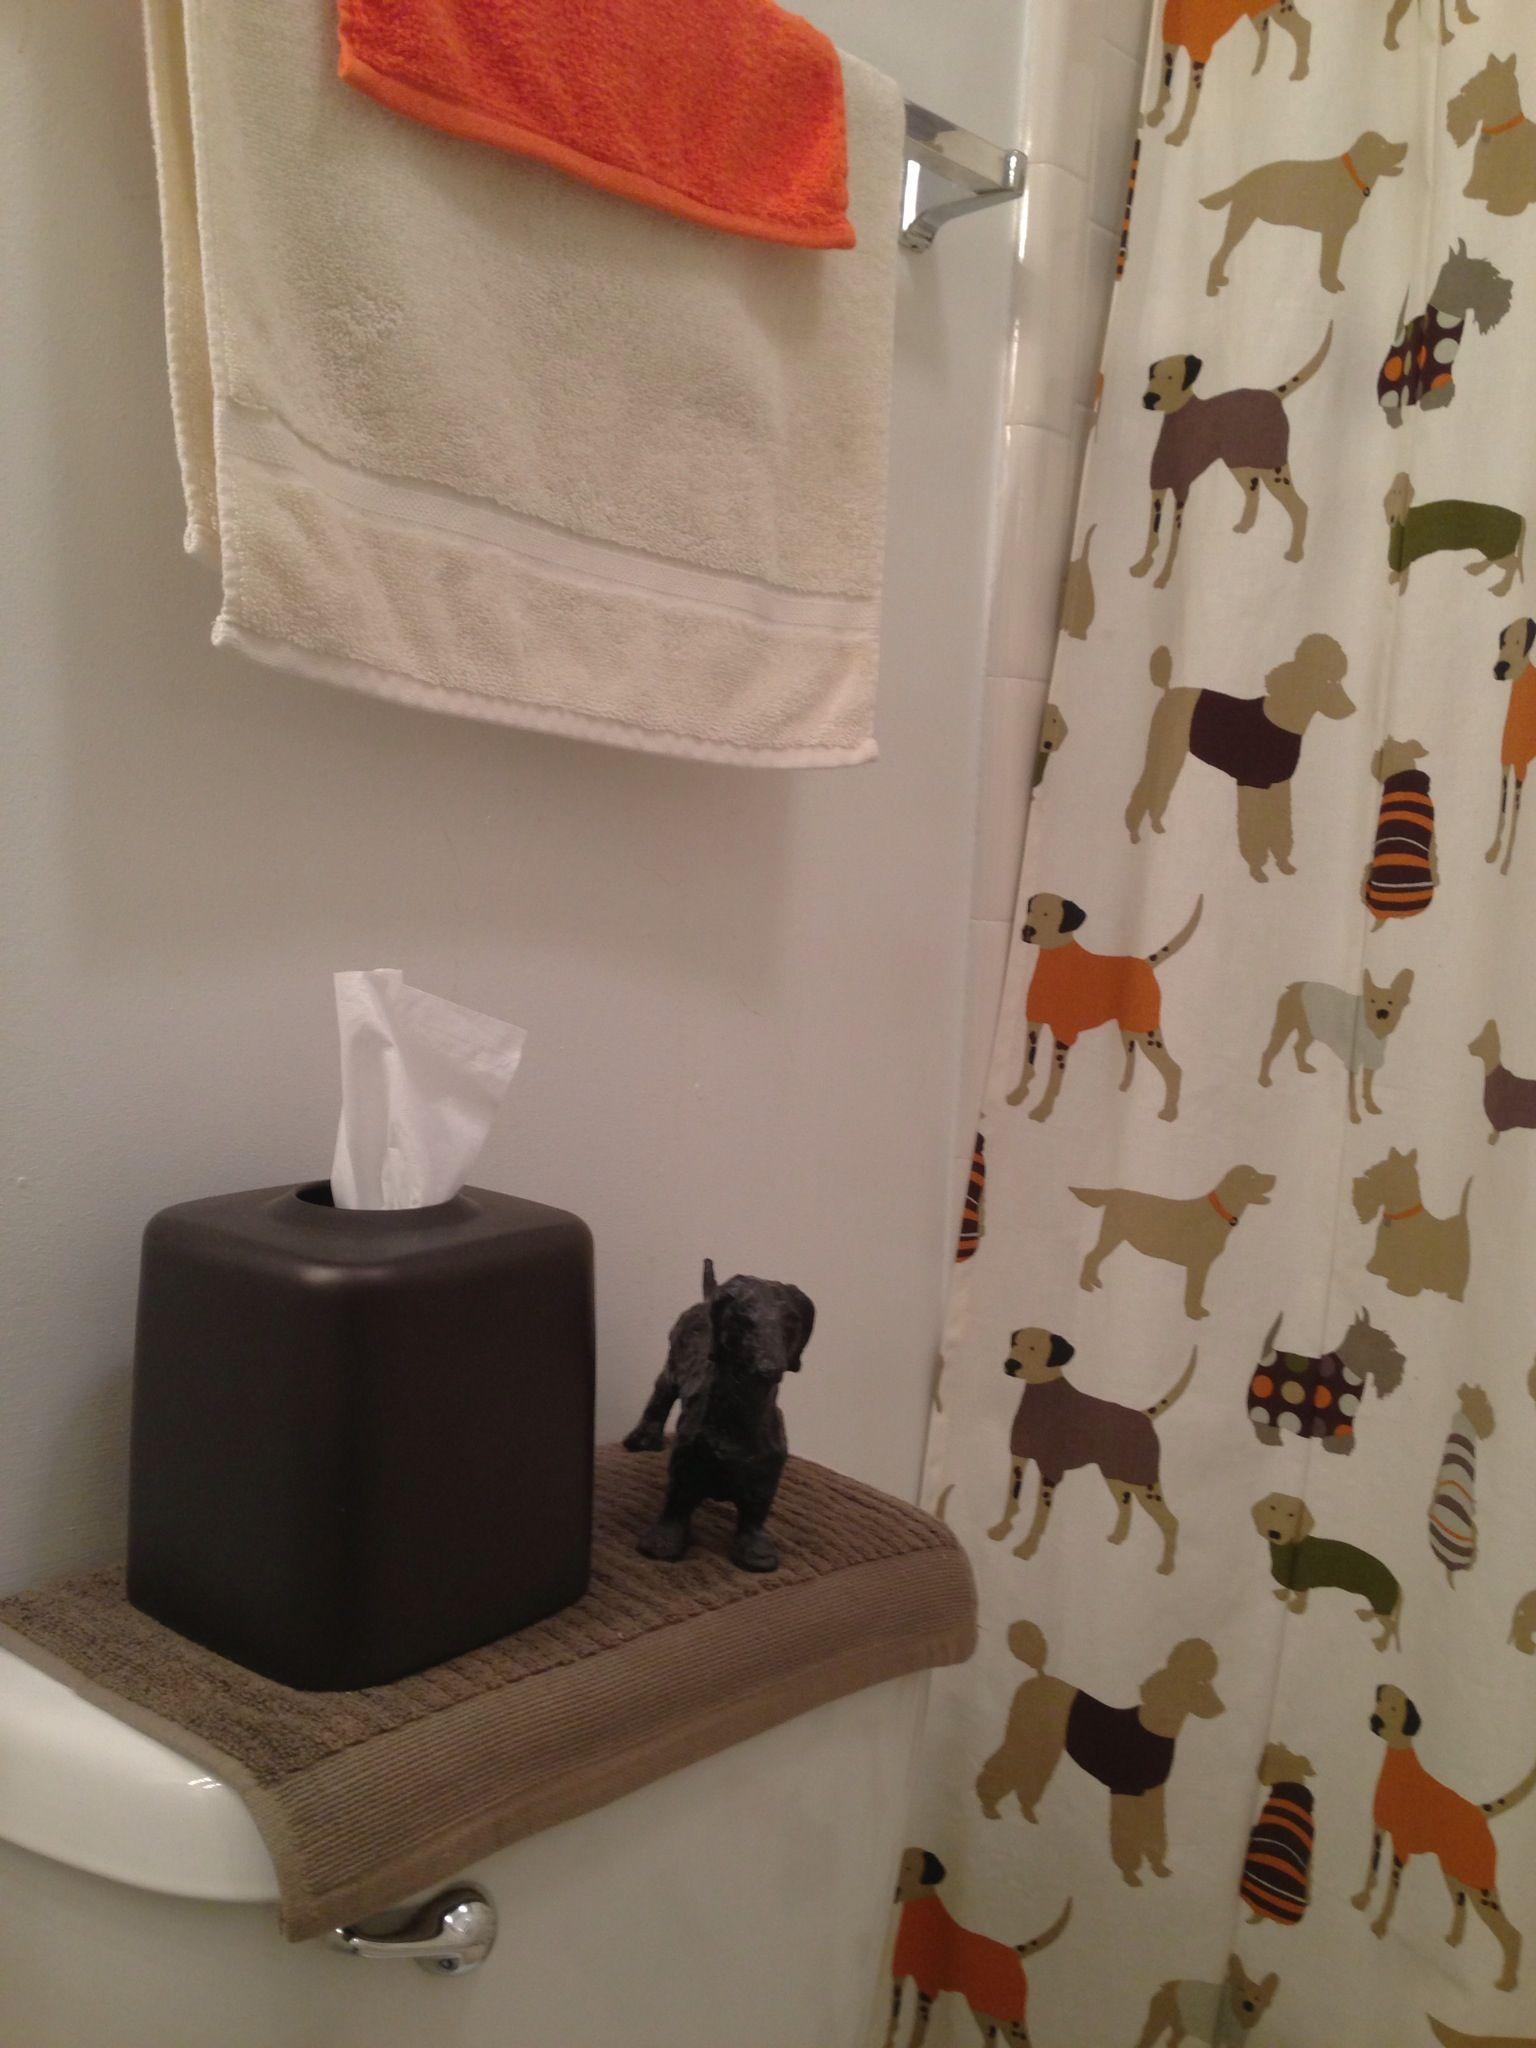 dogdecor #dog #decor  Dog lover decor, Dog bathroom decor, Dog